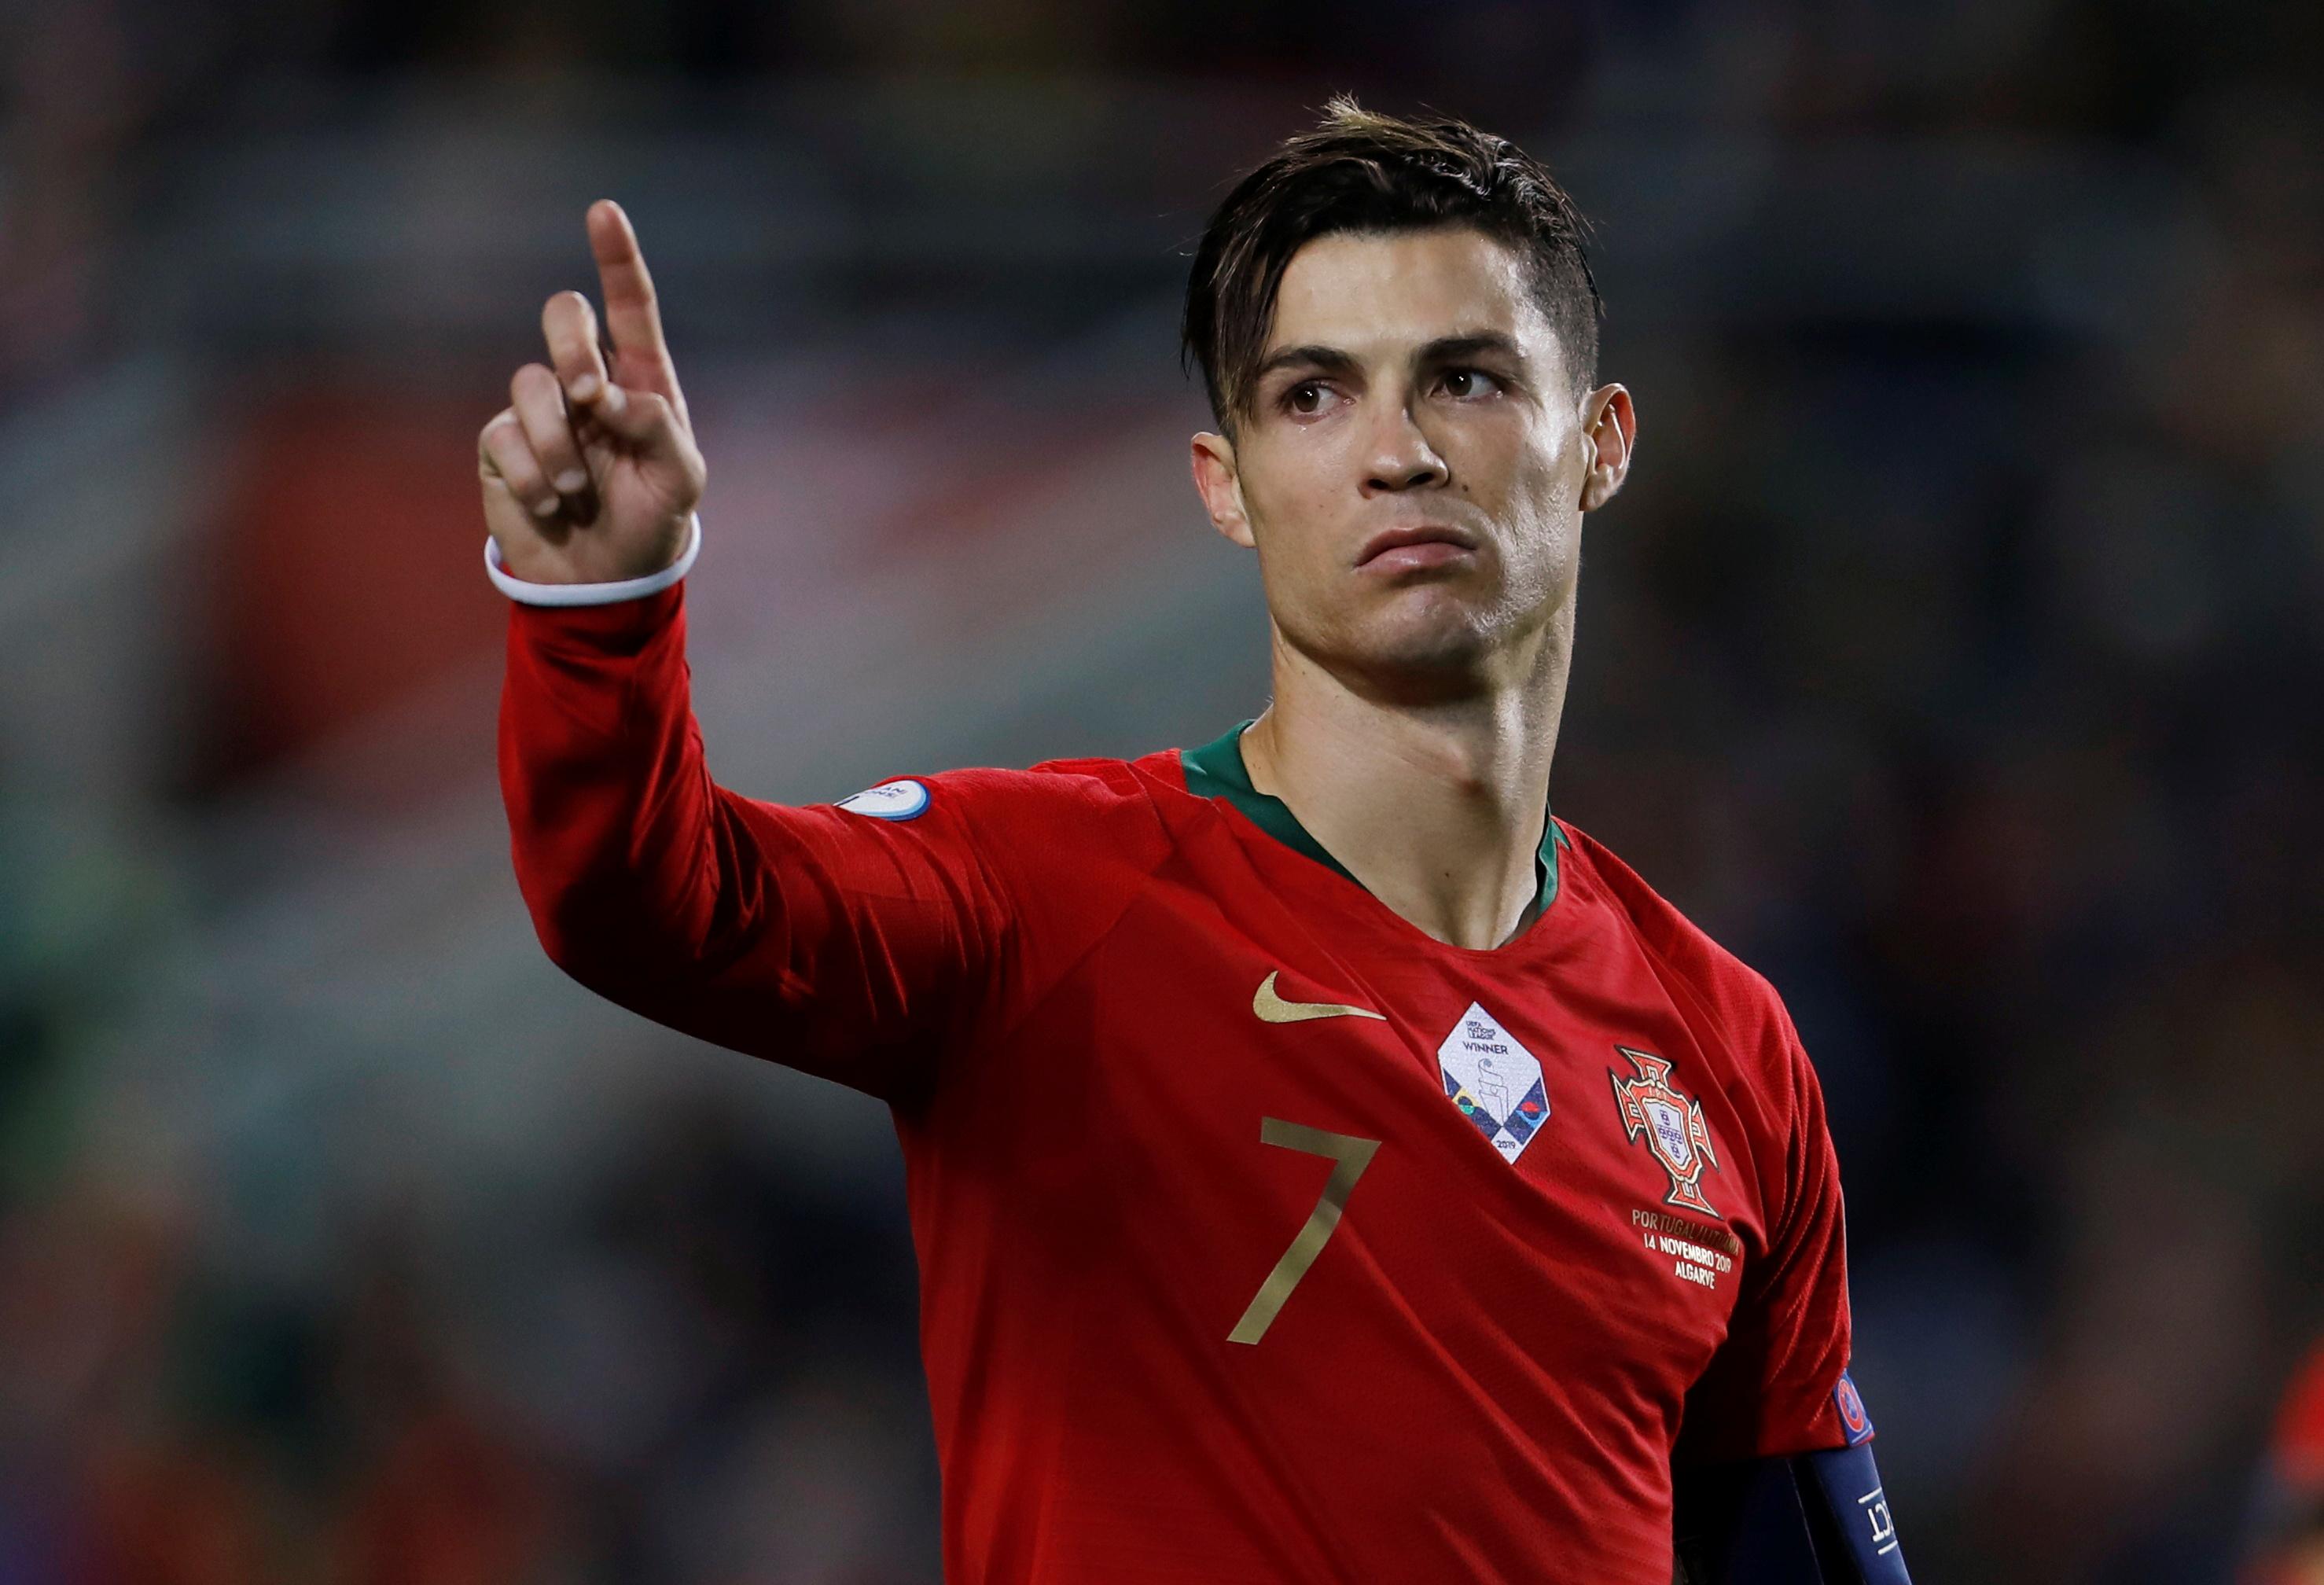 Juventus' Cristiano Ronaldo wins 2018-19 Serie A Best Player award